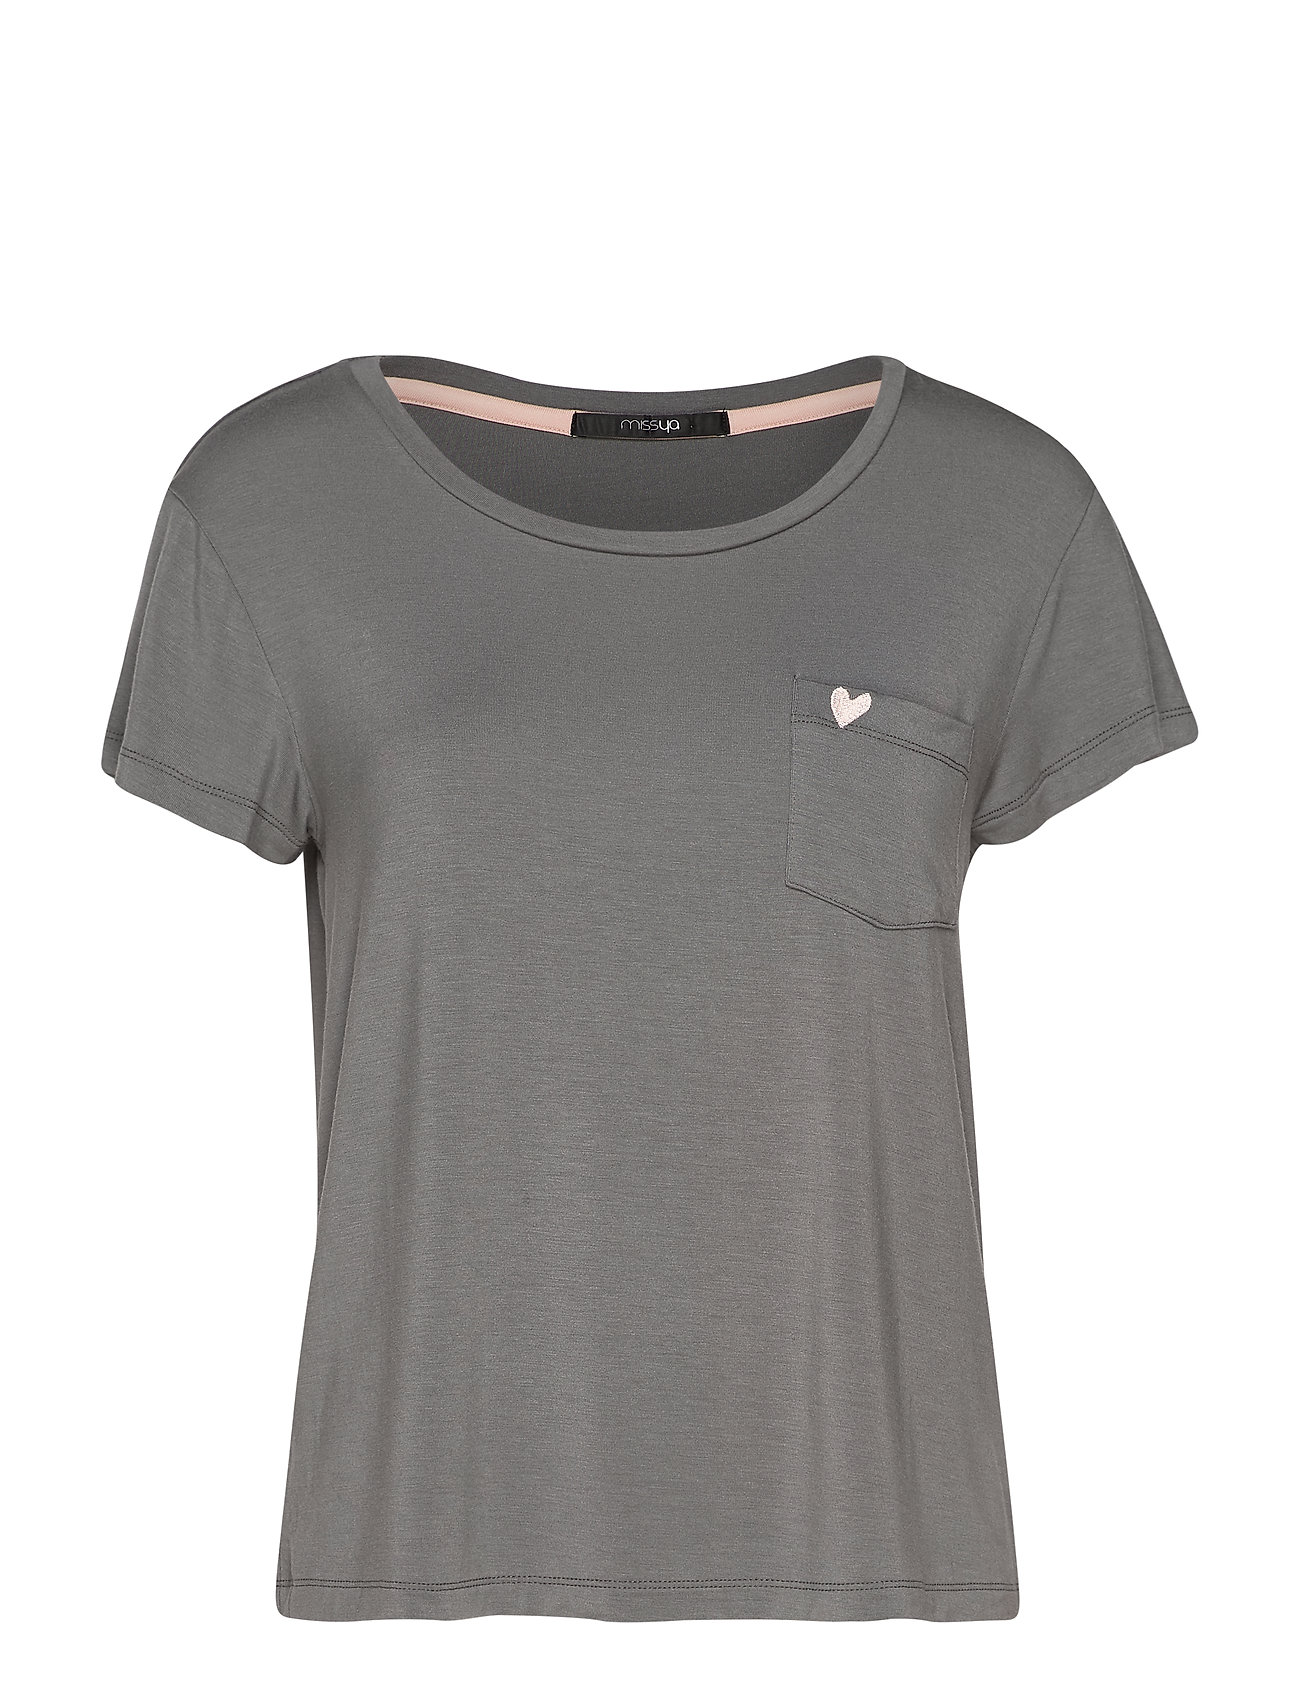 Missya Softness t-shirt - STEEL GREY